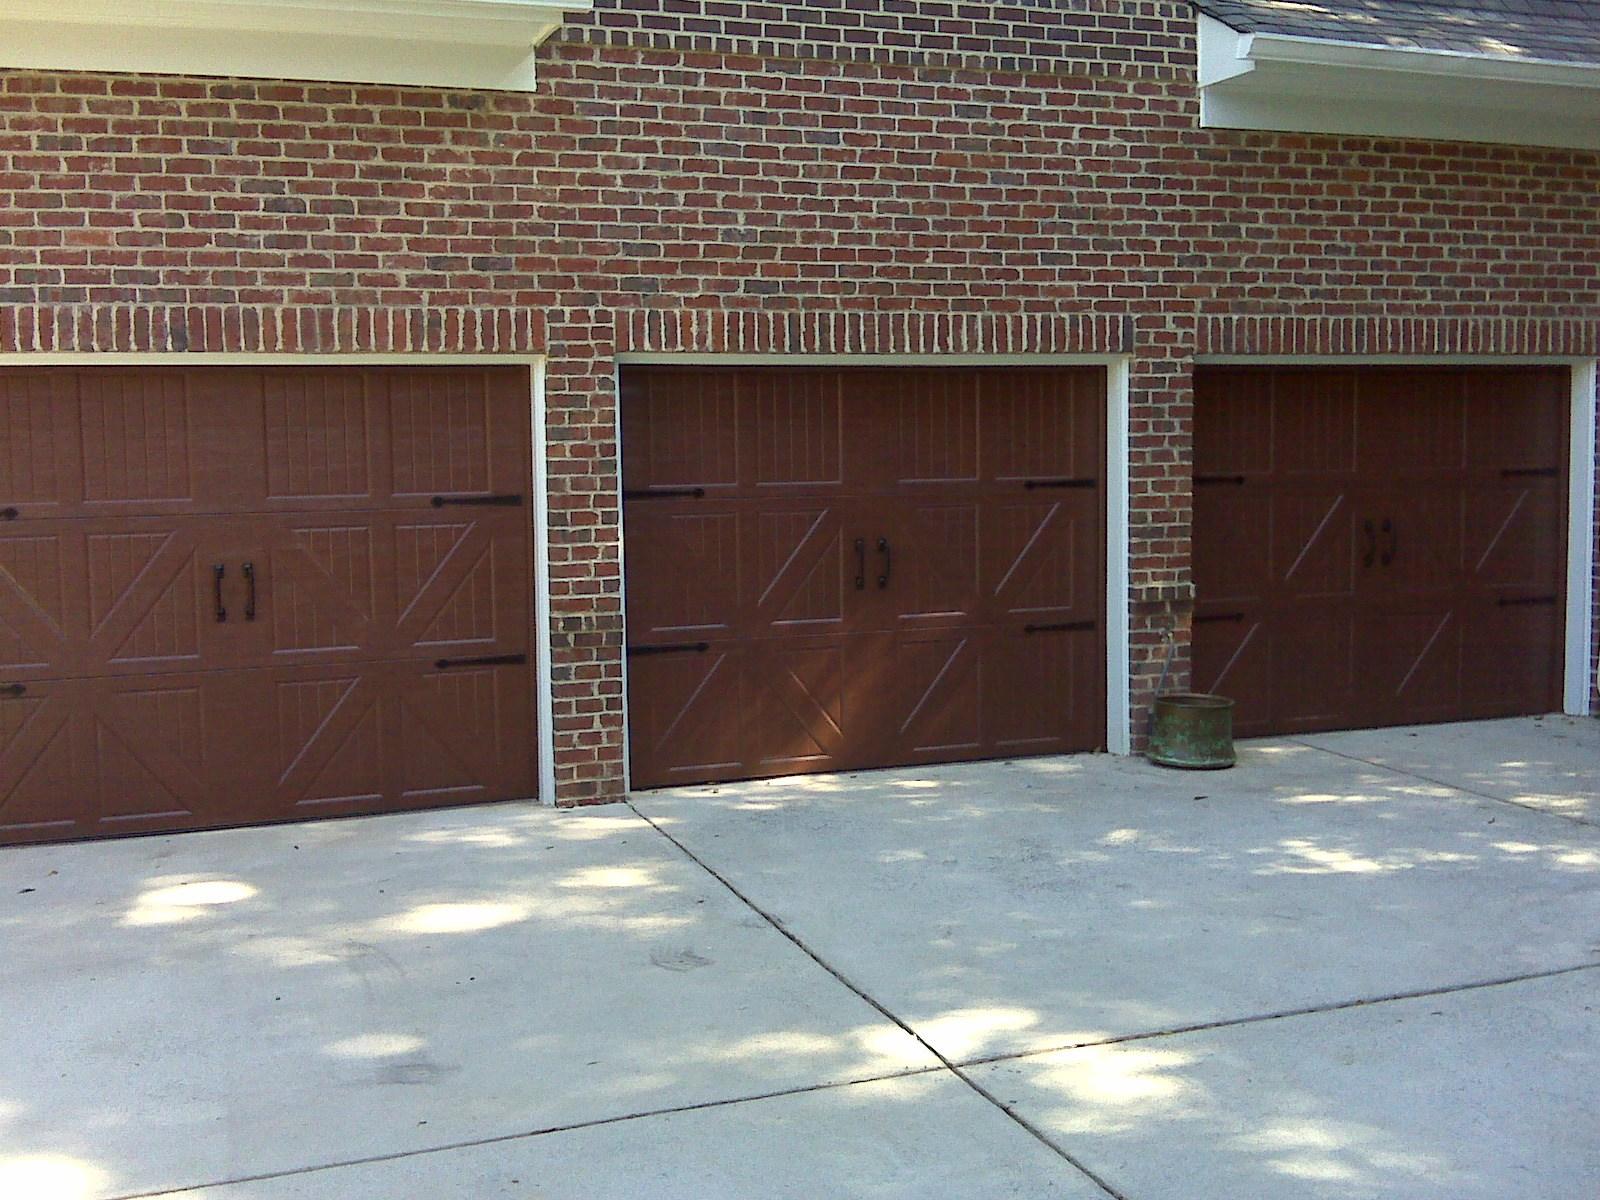 1200 #412B26 Precision Door Service Charlotte Monroe NC 28110 Angies List save image Precision Entry Doors 45771600